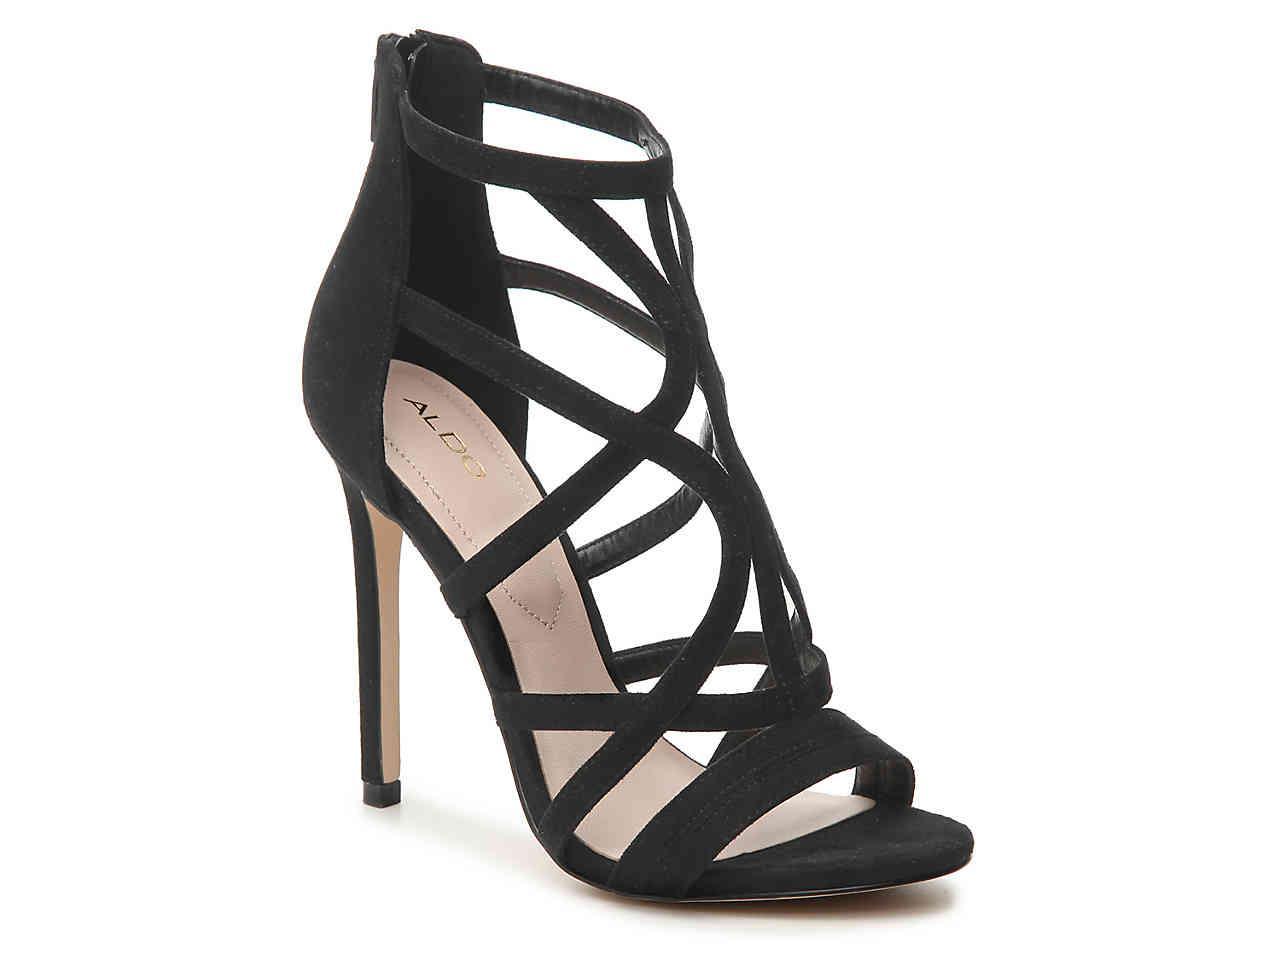 d835032c2838 Lyst - ALDO Tifania Sandal in Black